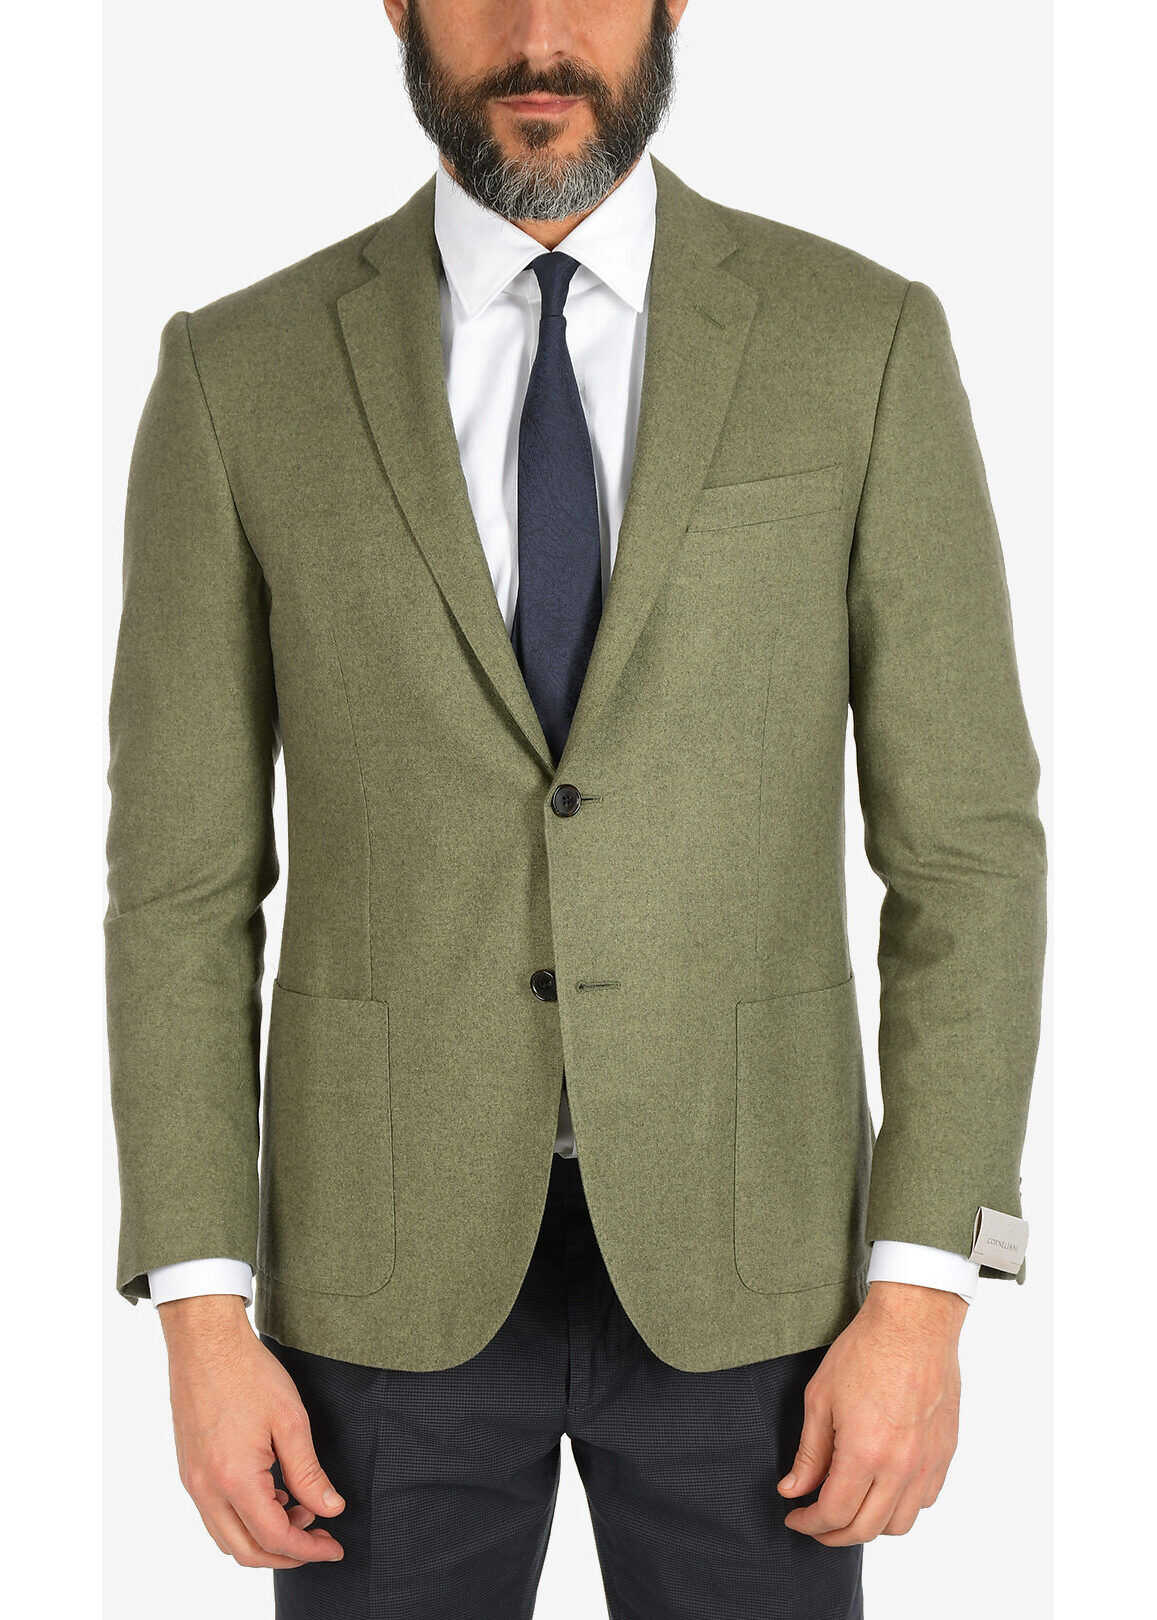 CORNELIANI silk and cashmere ACADEMY SOFT 2-button blazer GREEN imagine